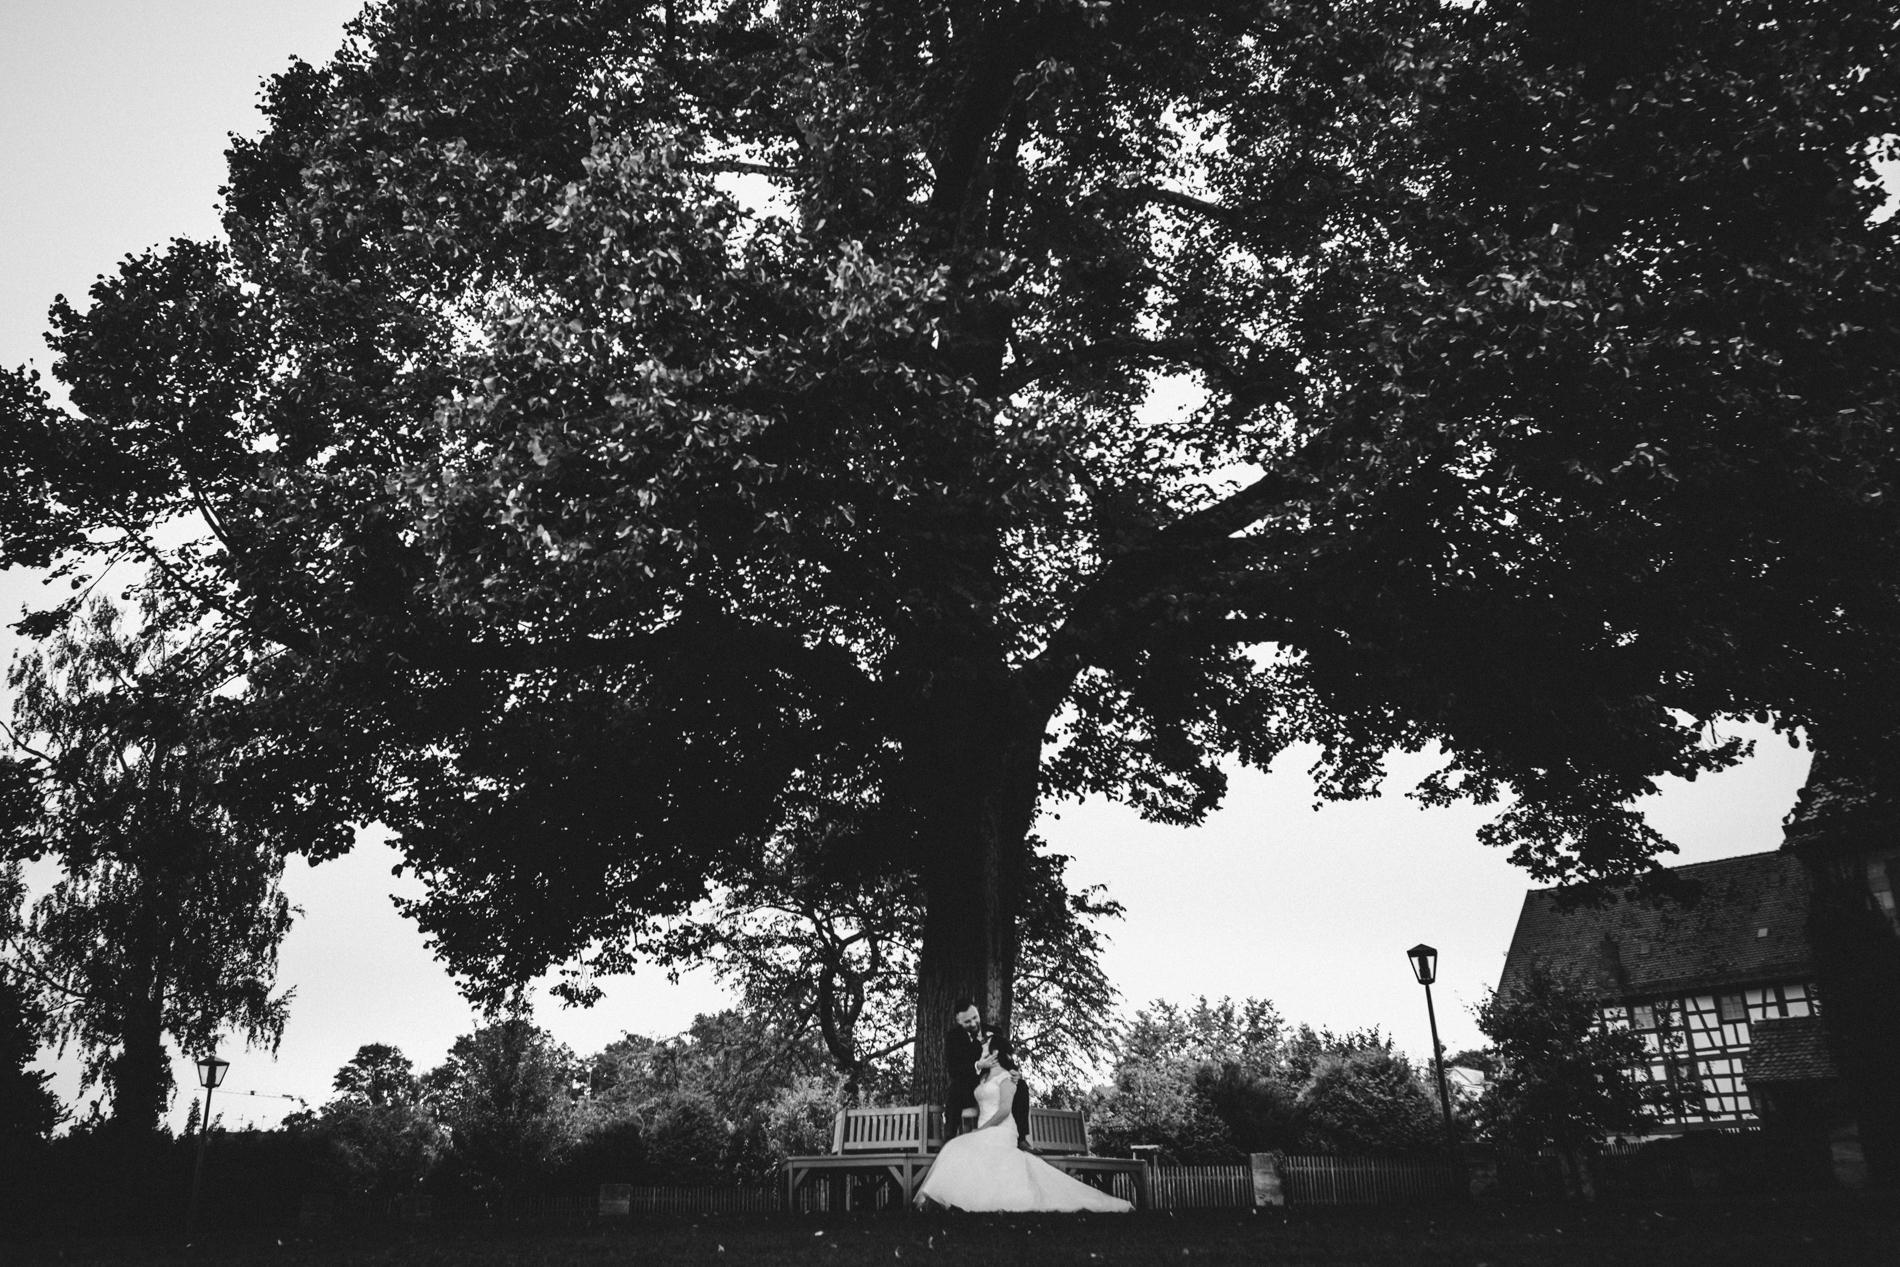 Hochzeitsfotografin-Cadolzburg